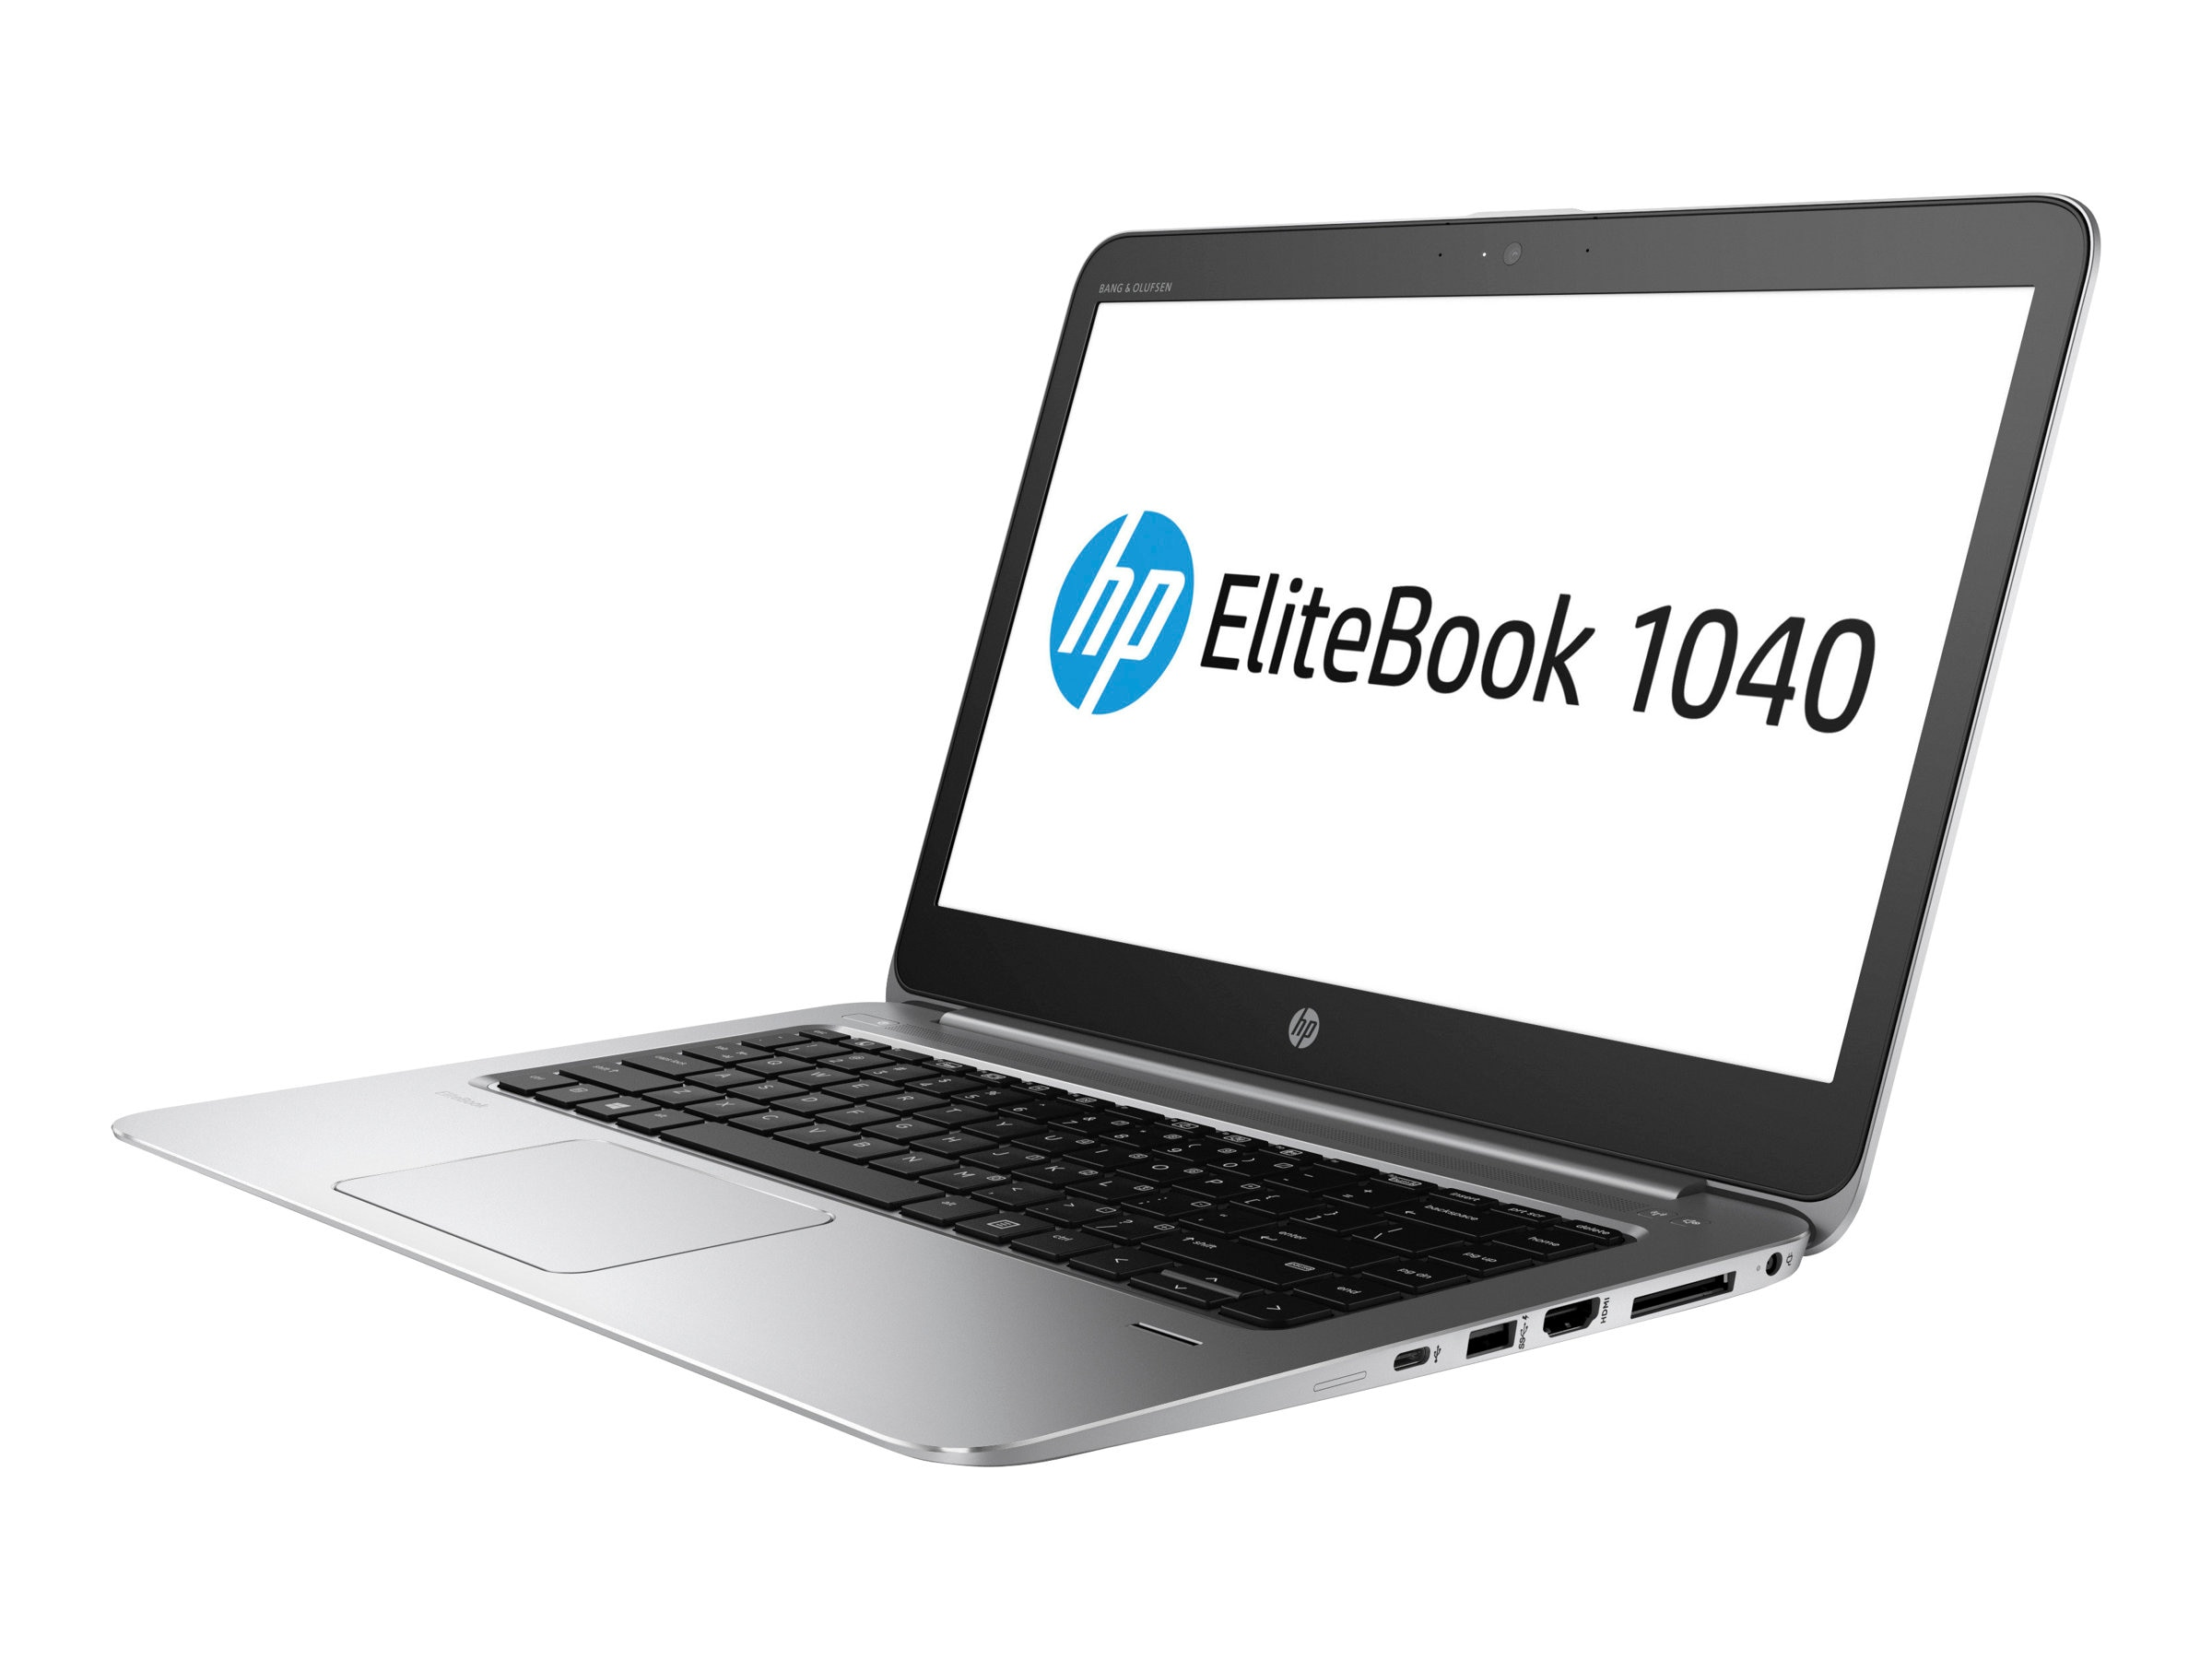 HP EliteBook 1040 G3 2.3GHz Core i5 14in display, V1P90UT#ABA, 31257095, Notebooks